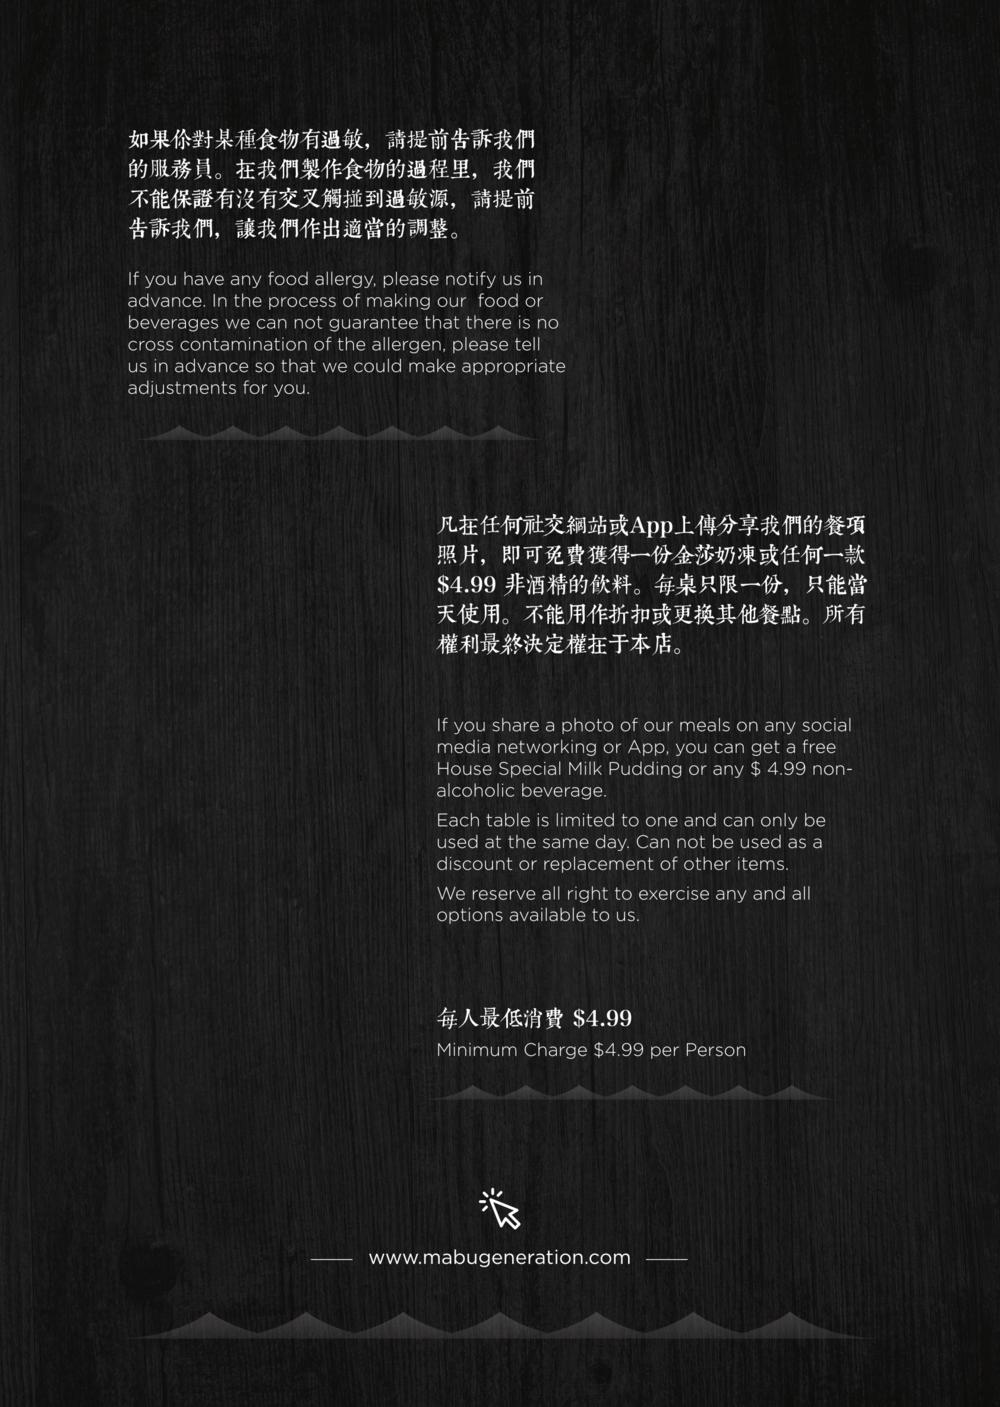 menu2018_小吃饭类-print-2-1.png